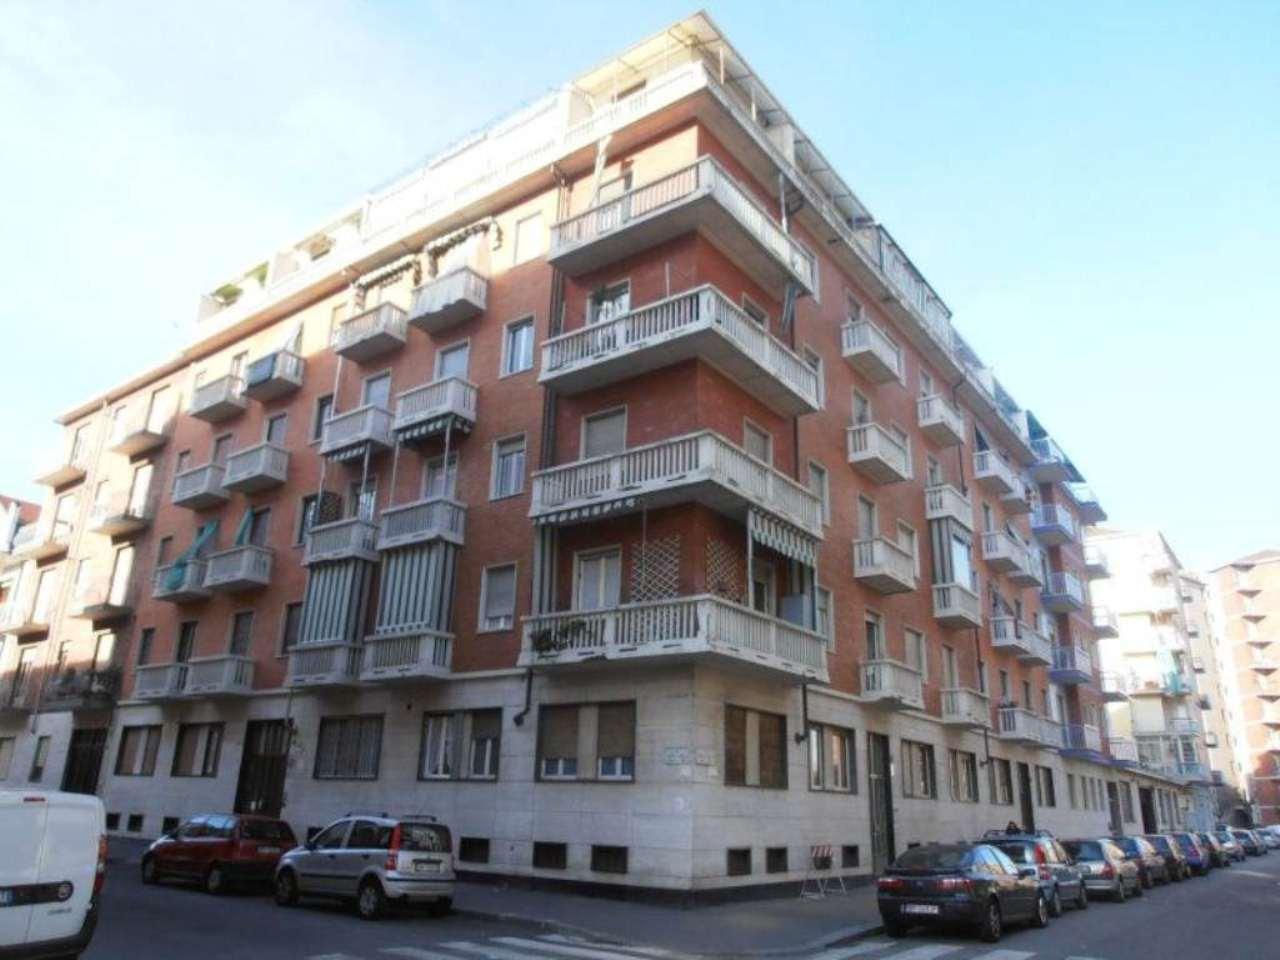 Bilocale Torino Via Baracca 1